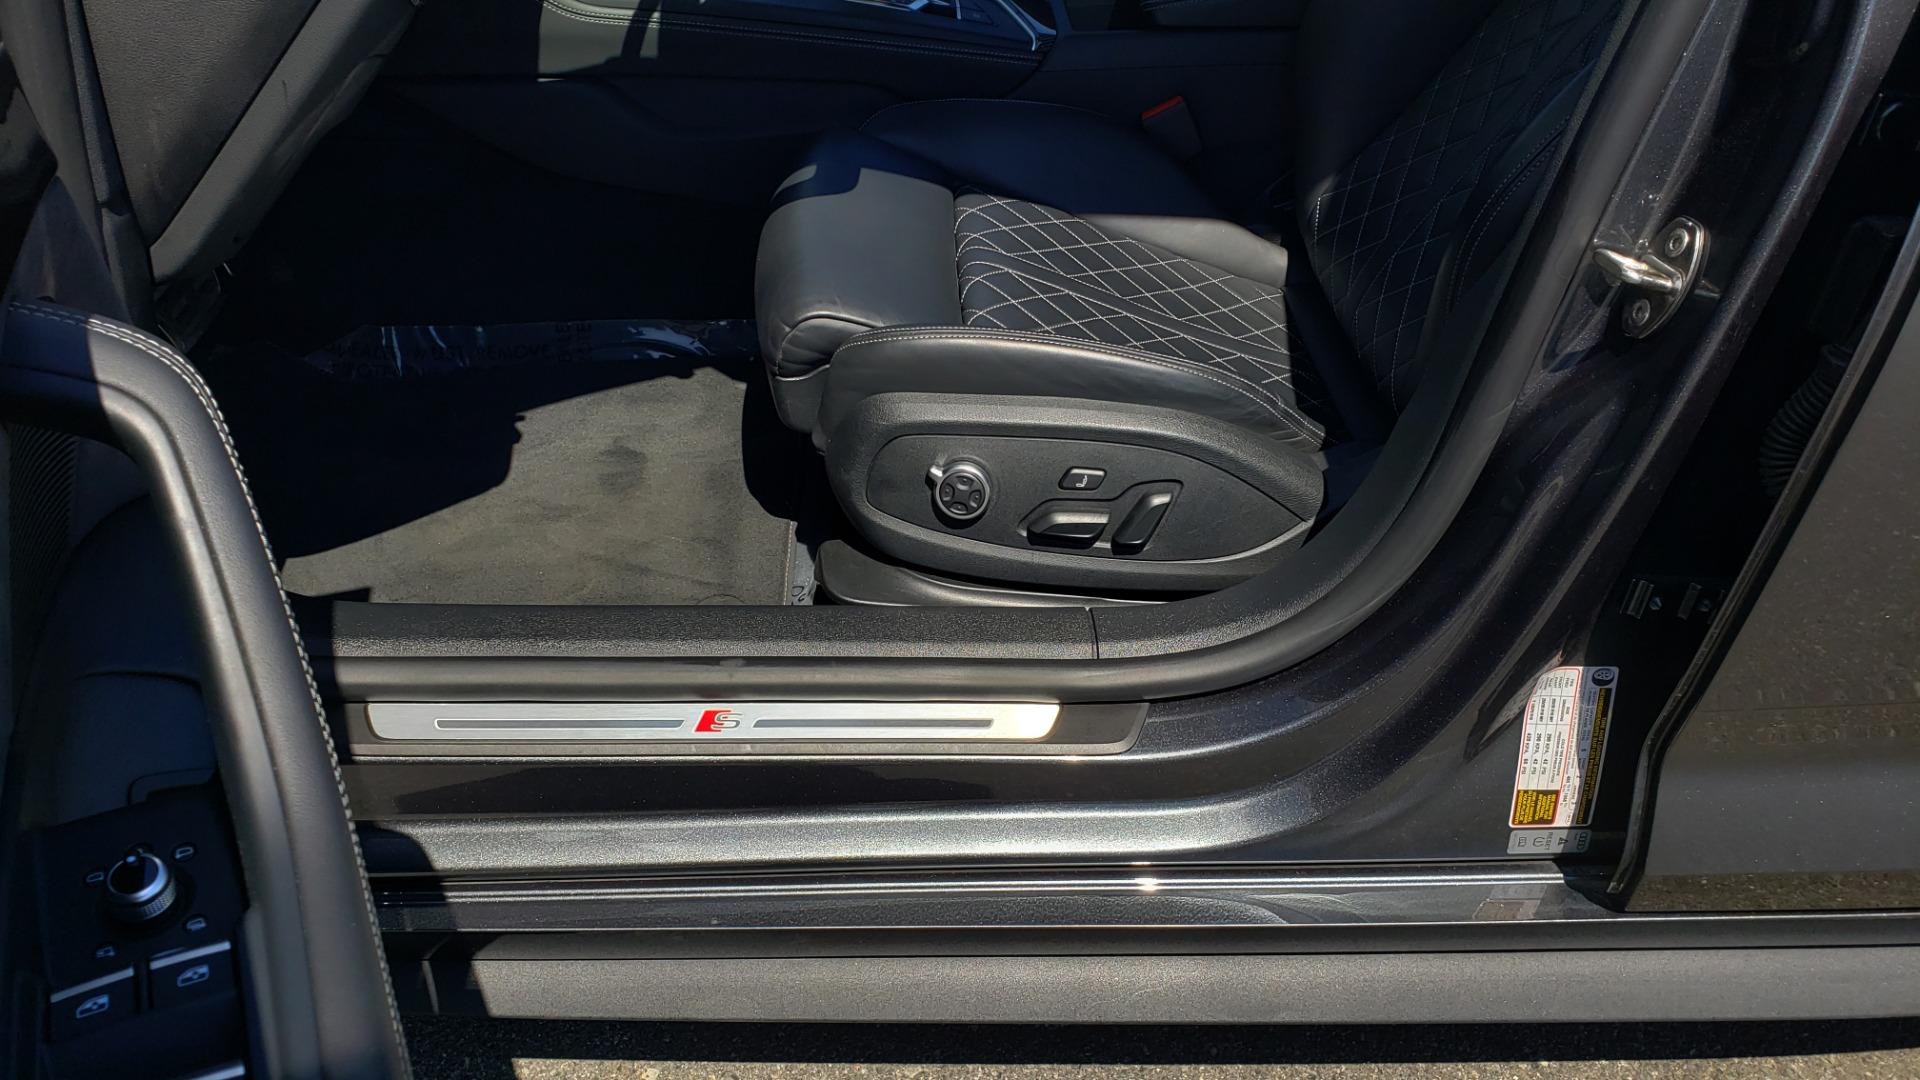 Used 2018 Audi S5 SPORTBACK PRESTIGE S-SPORT / NAV / SUNROOF / HUD / B&O SND / REARVIEW for sale $48,995 at Formula Imports in Charlotte NC 28227 33